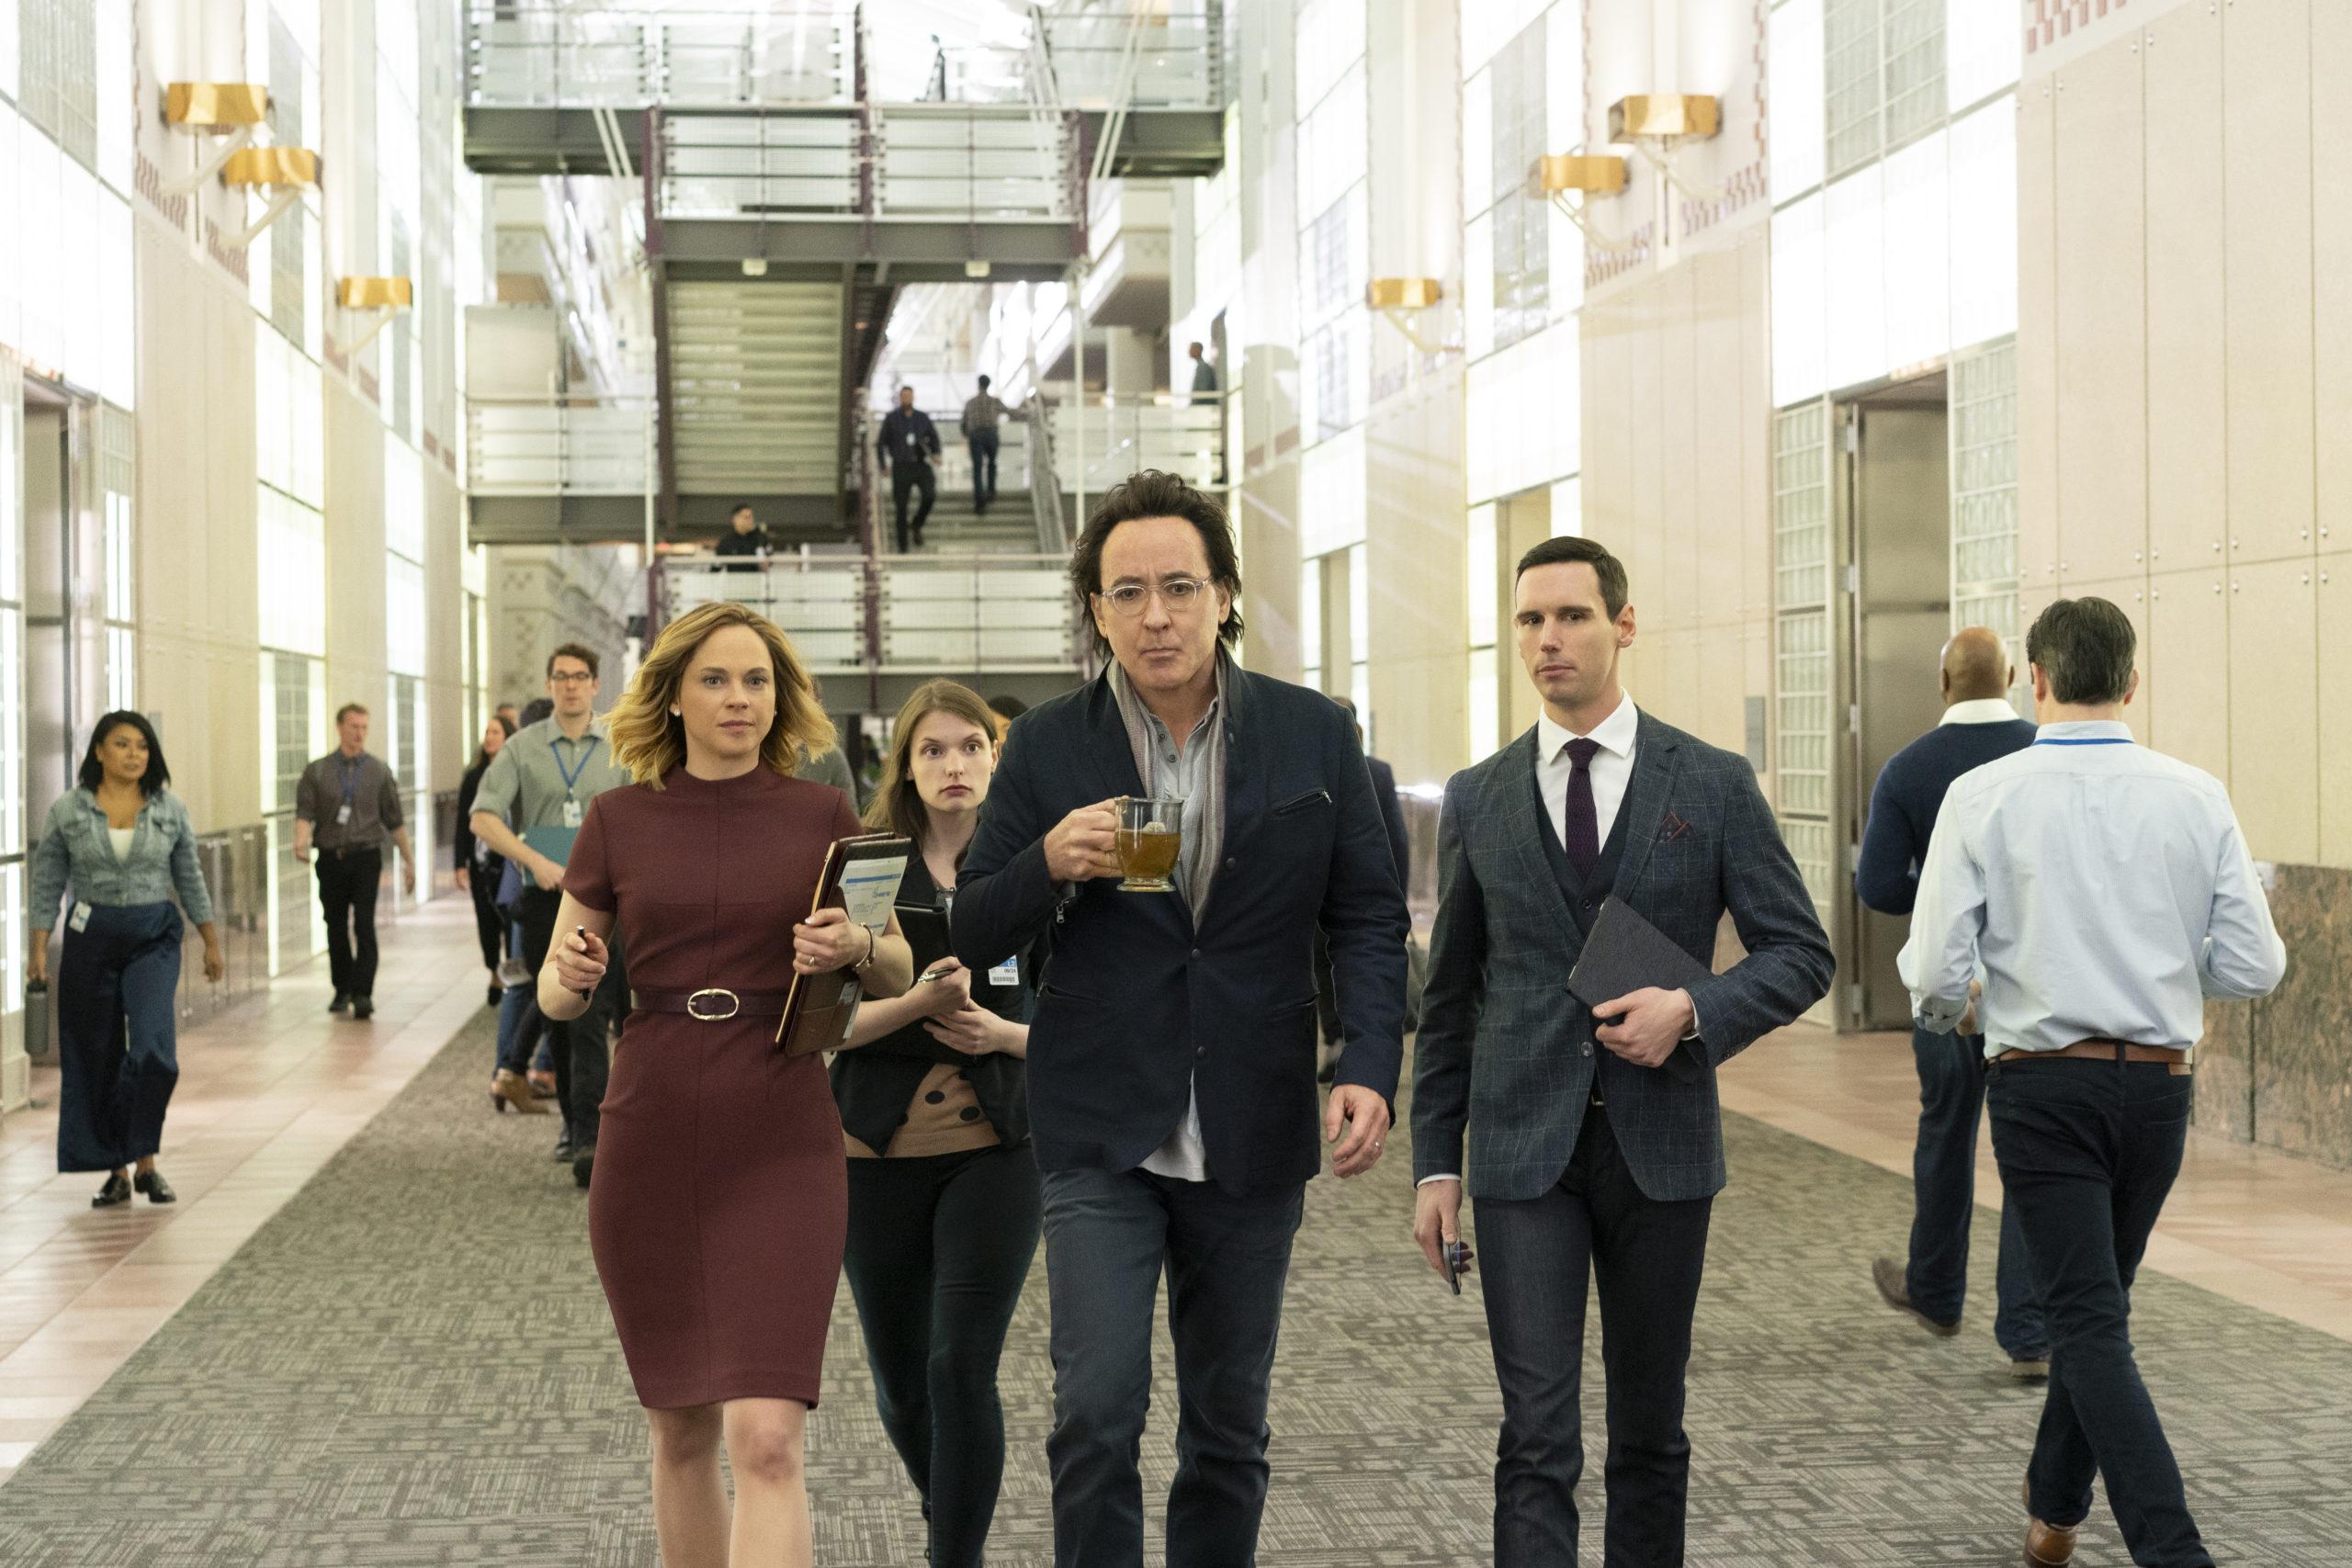 Gotham-Star Cory Michael Smith in Utopia Staffel 1 - Amazon